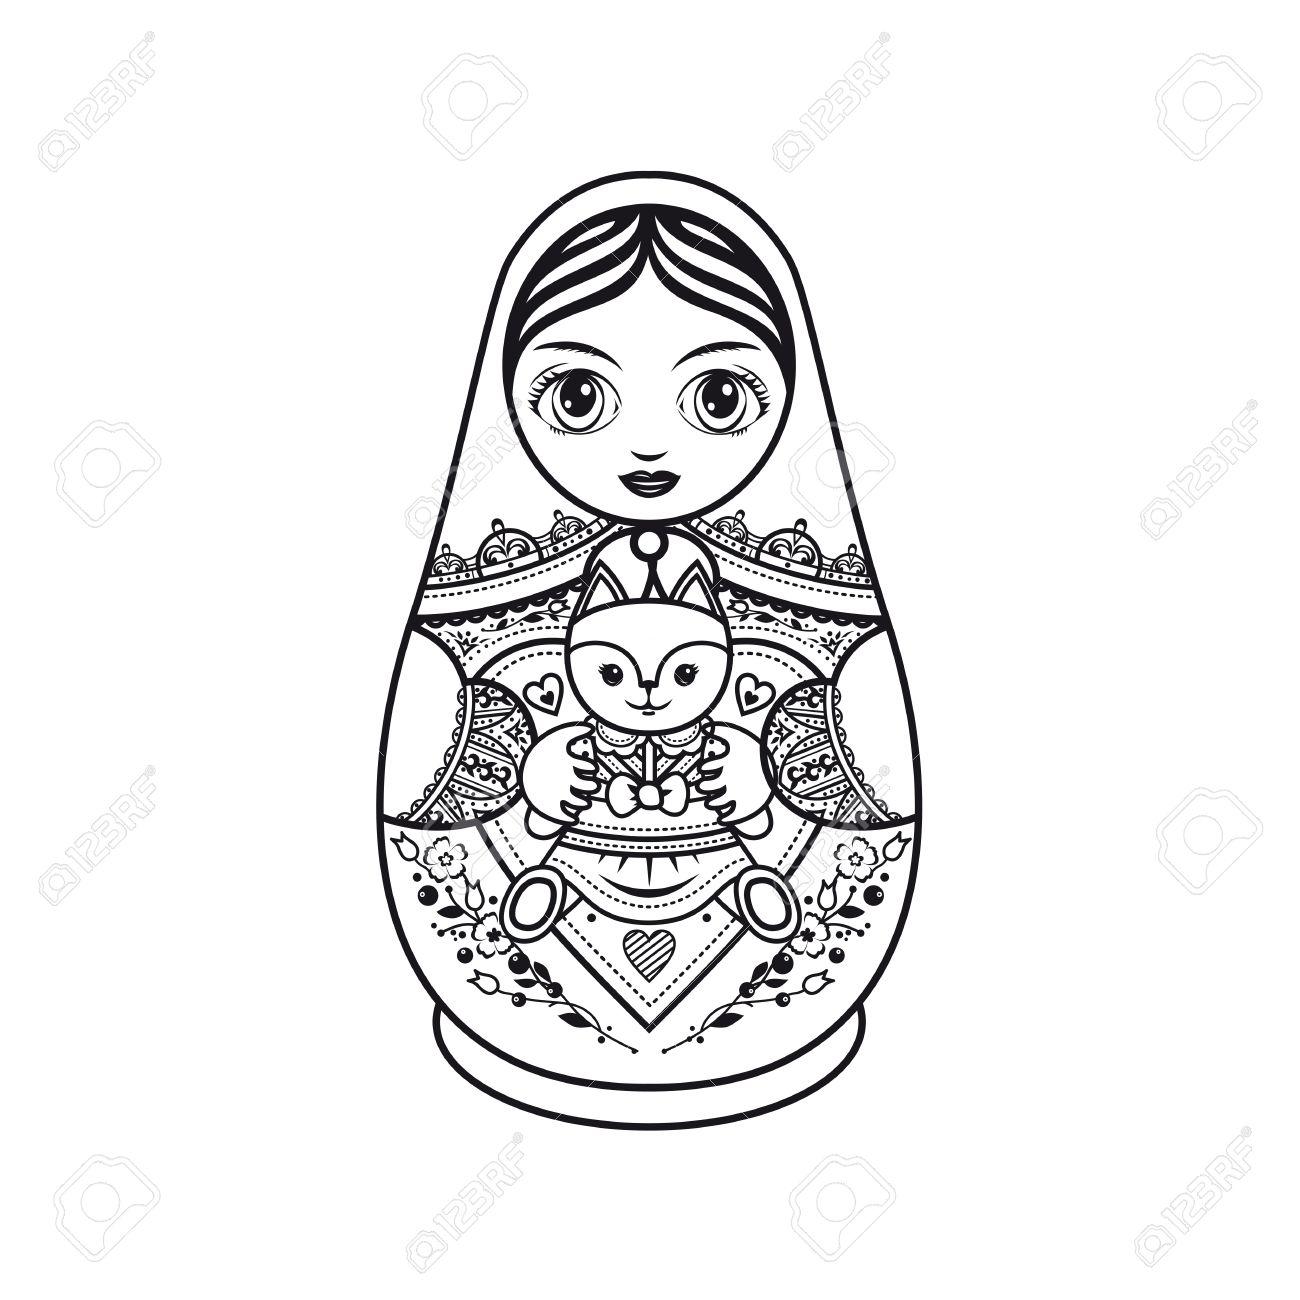 Matryoshka Russian Folk Nesting Doll Babushka Template For Coloring Book Monochrome